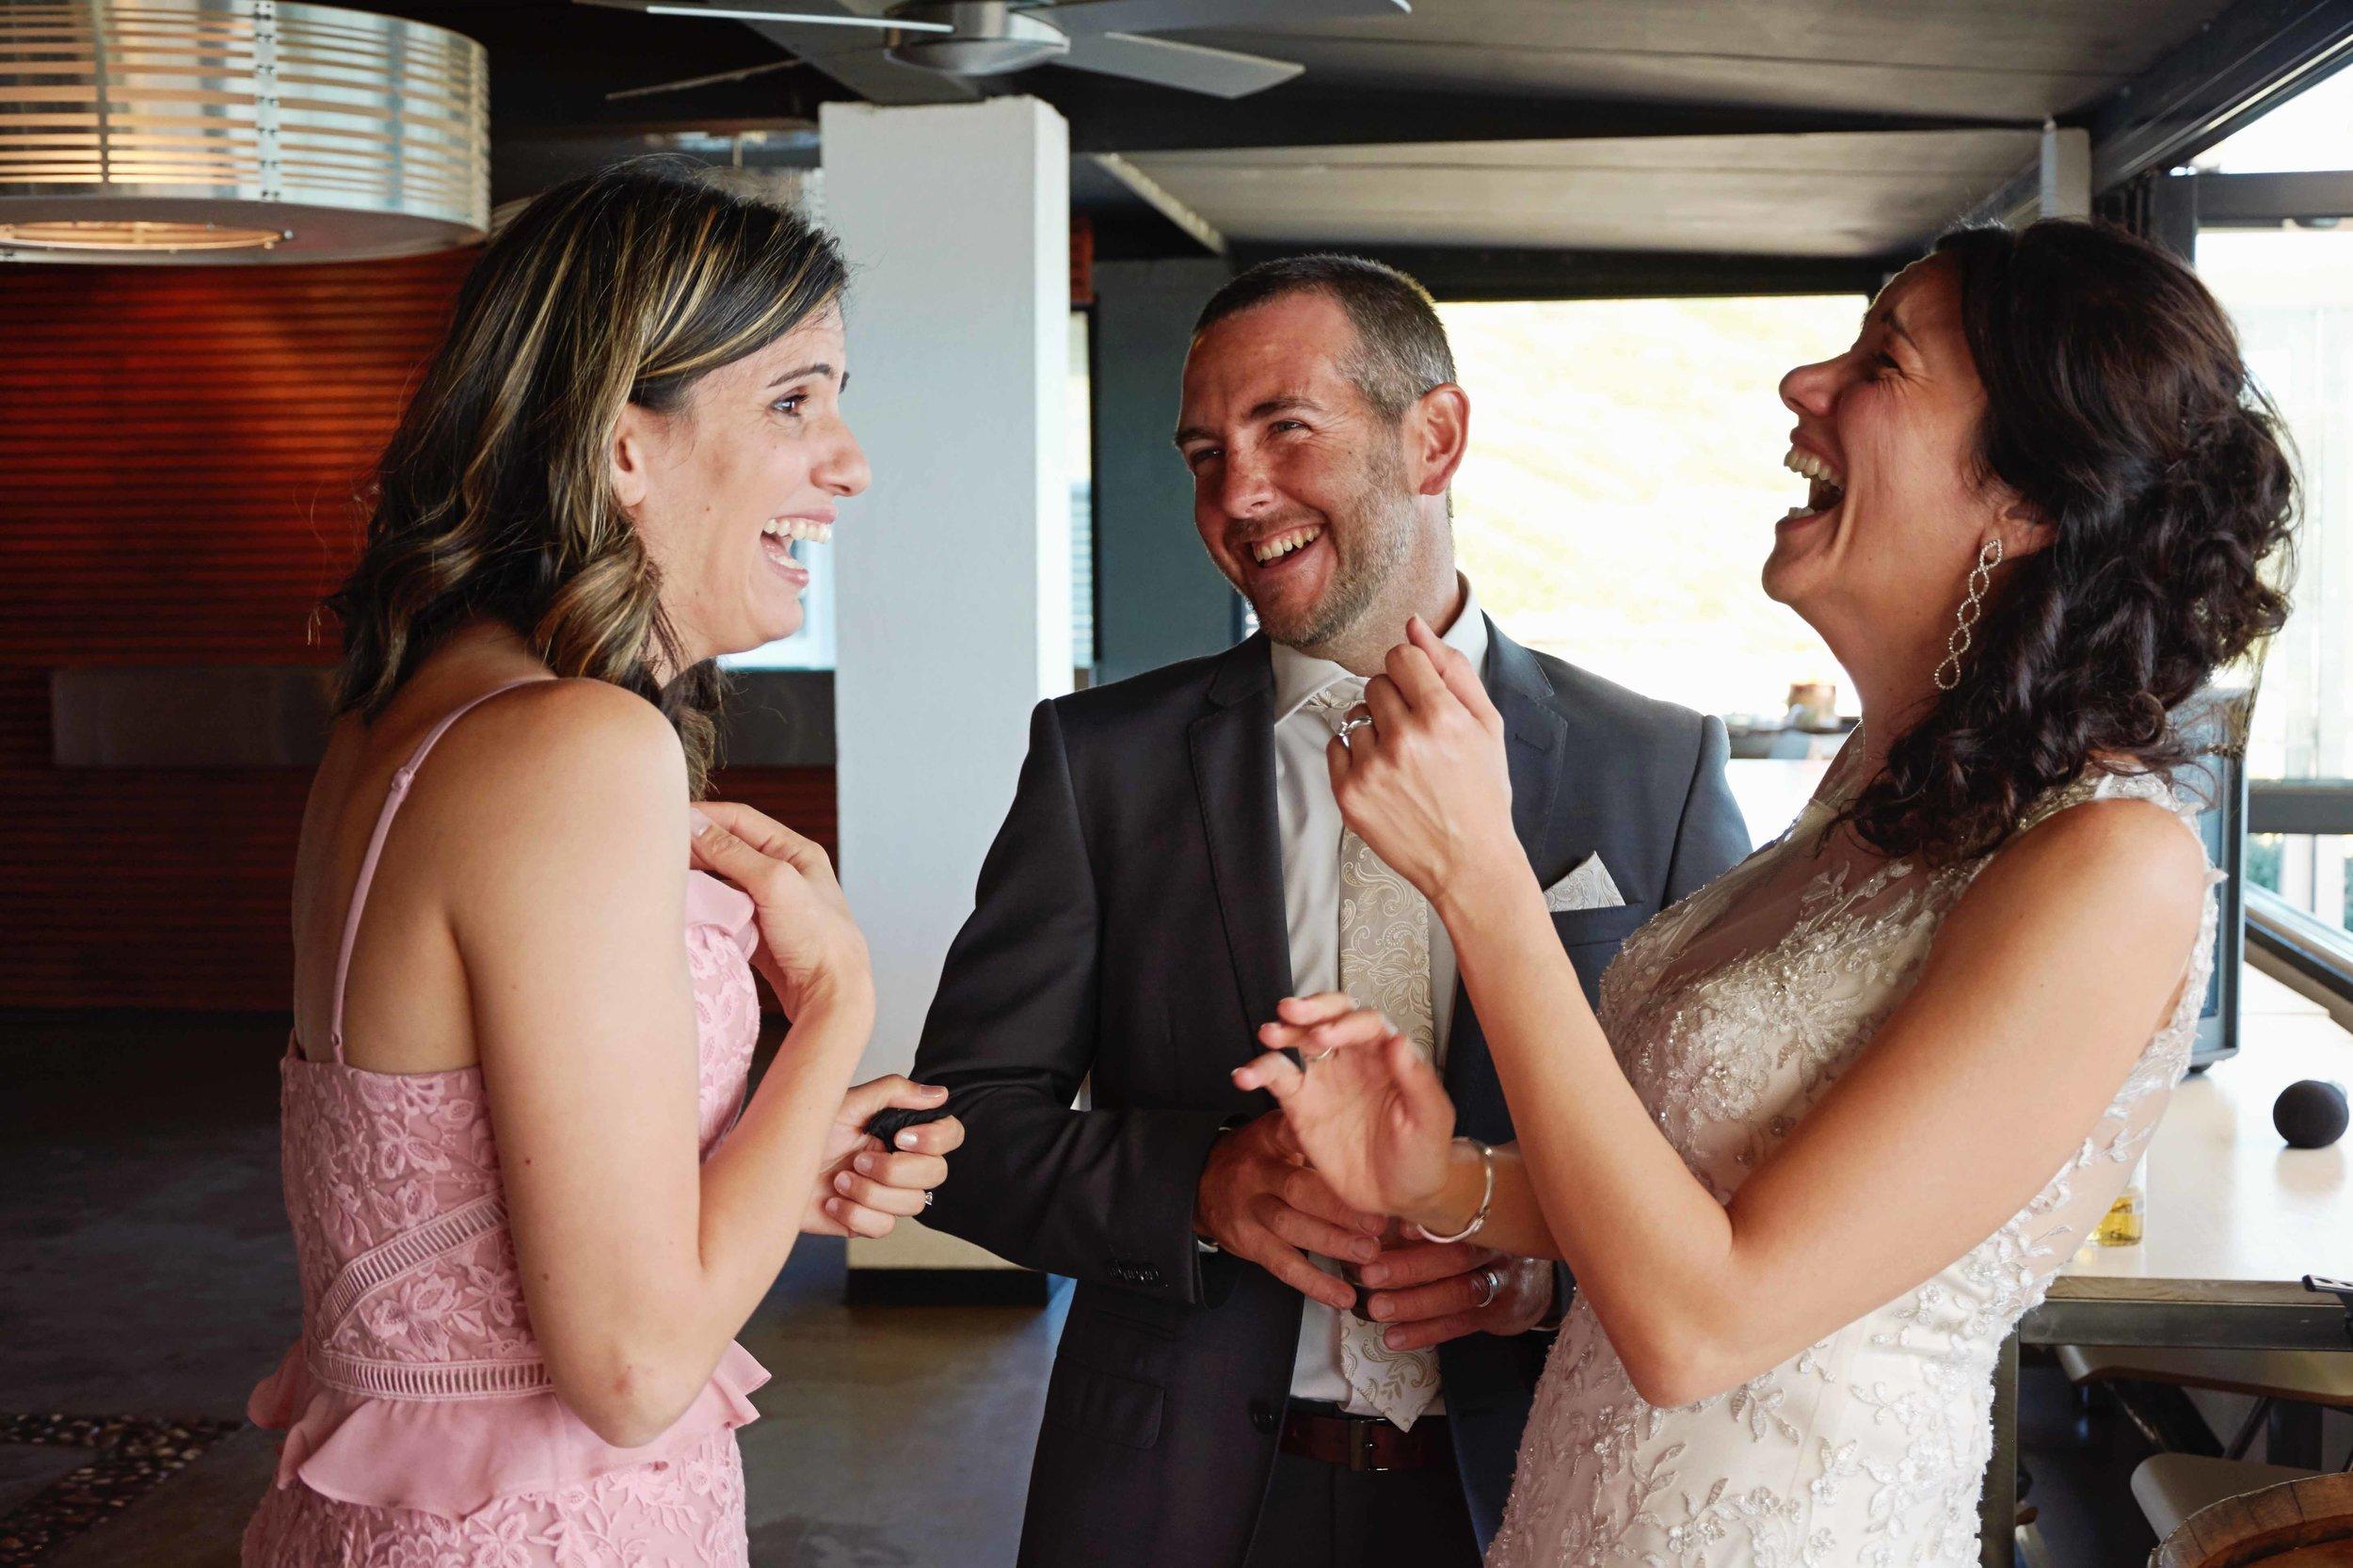 sorrento-wedding-photography-all-smiles-marissa-jade-photography-112.jpg